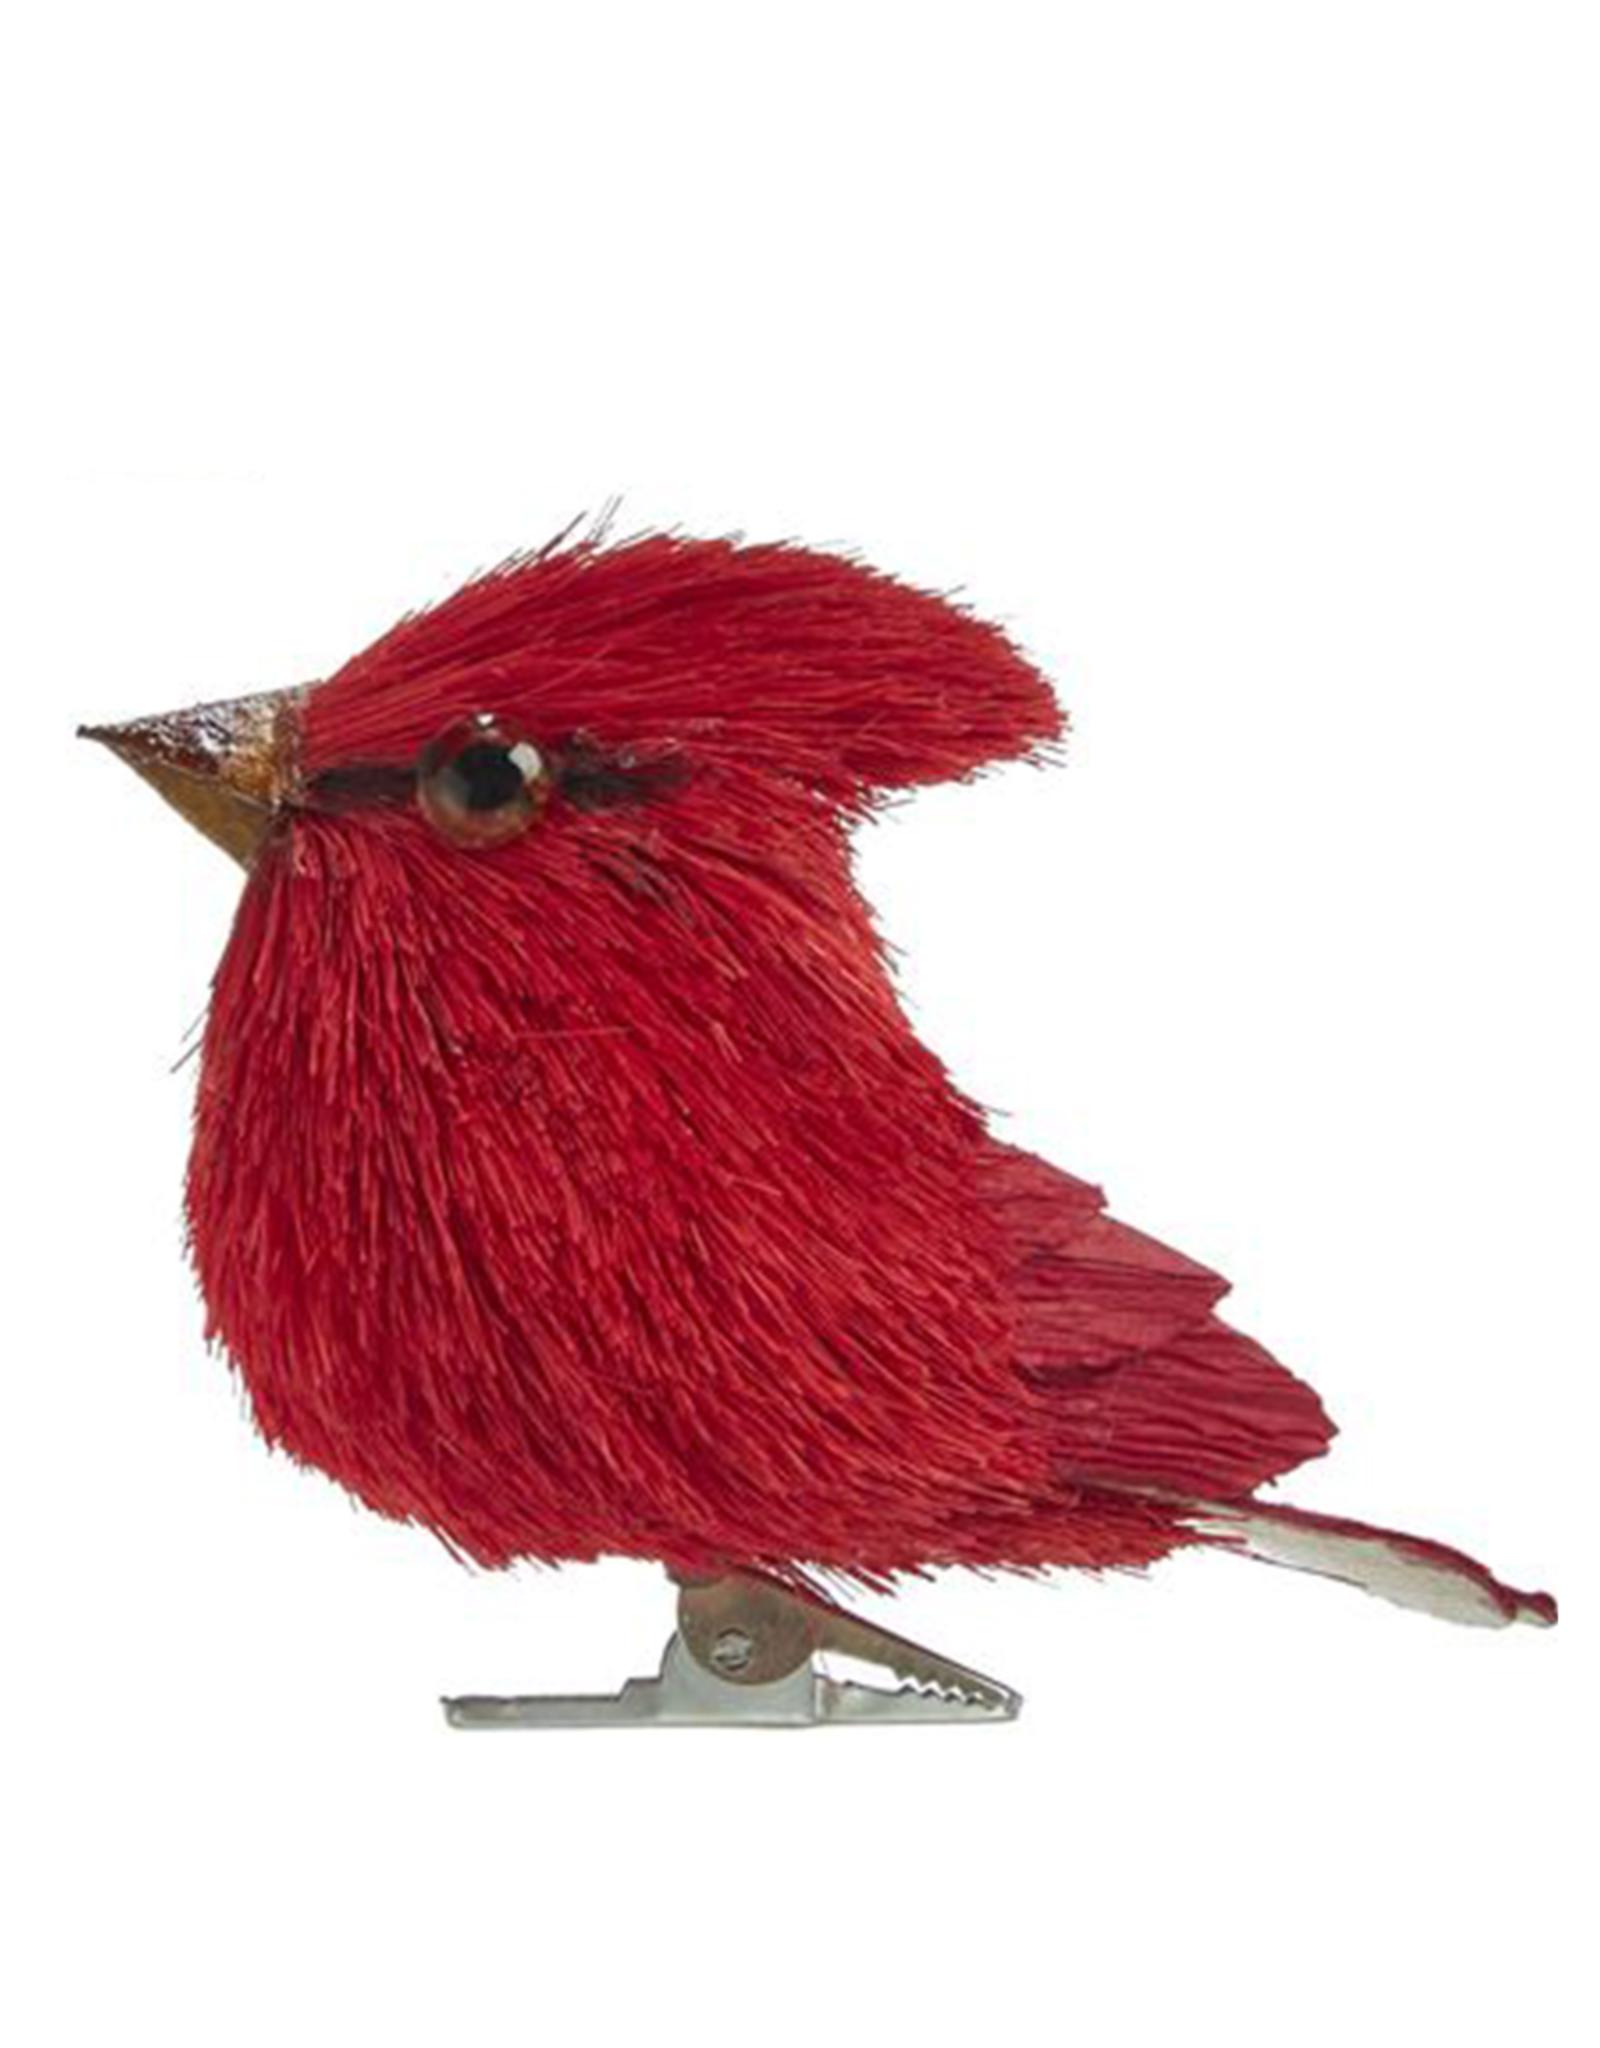 Kurt Adler Red Cardinal Sisal Bird With Clip Ornament 3 Inch Center Digs N Gifts